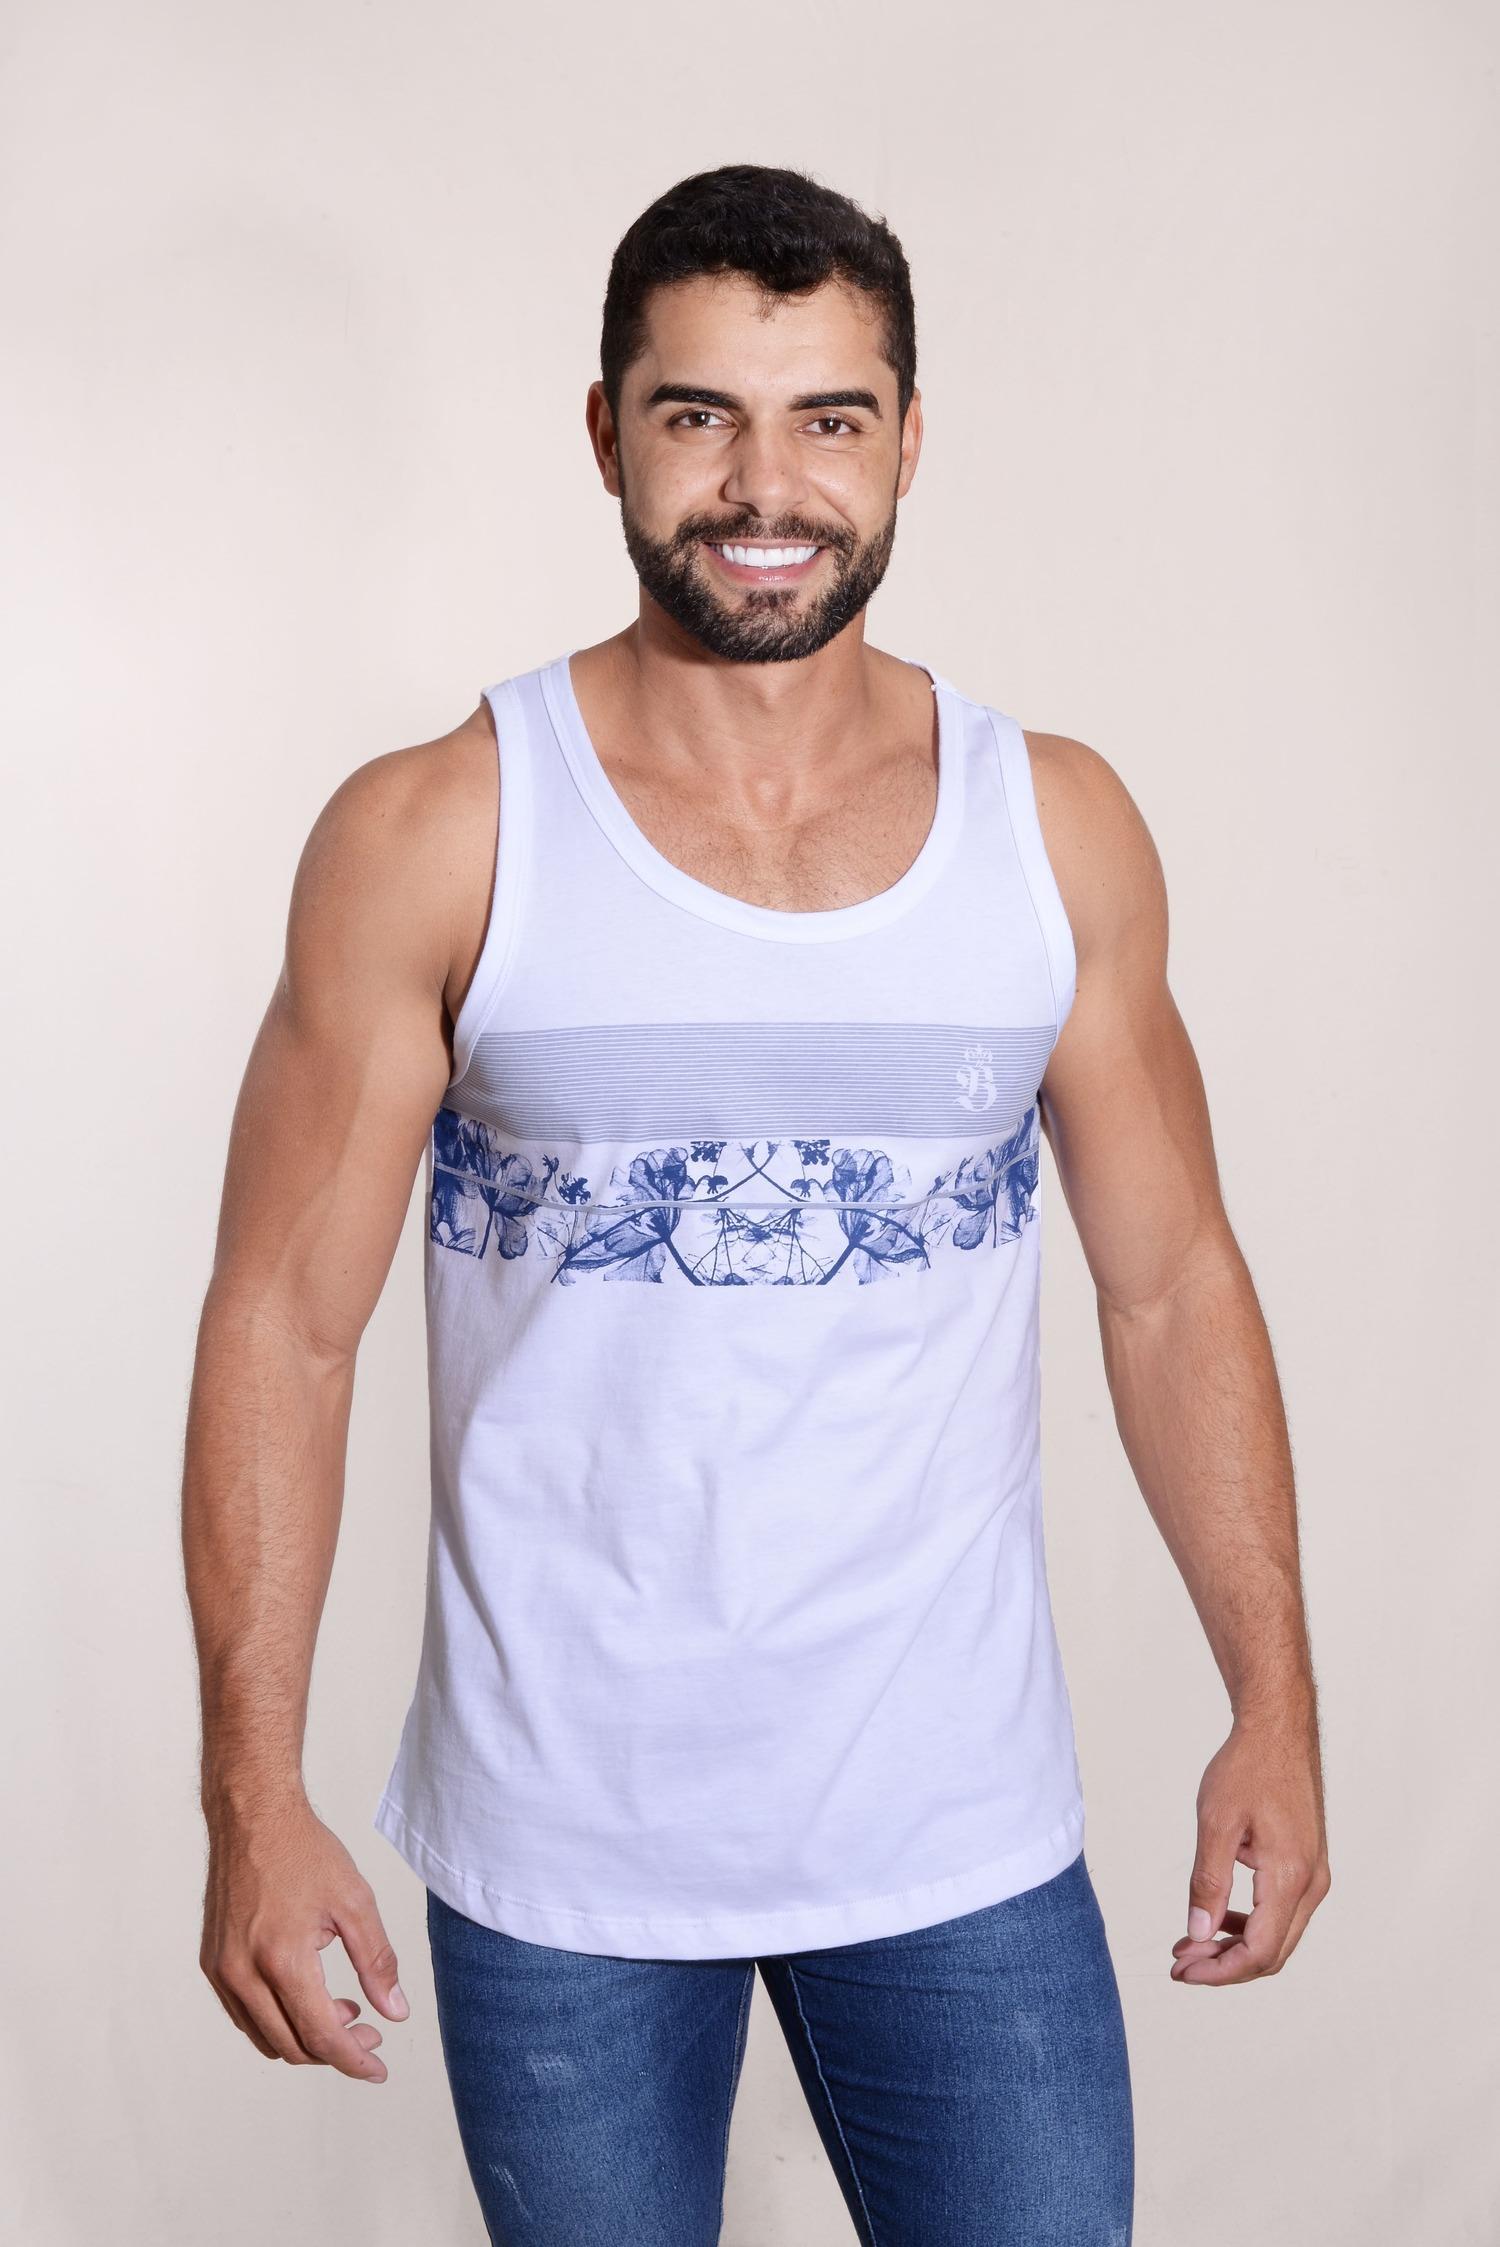 Camiseta Regata Floral Malha 100% Algodão Silk Frontal Burguês